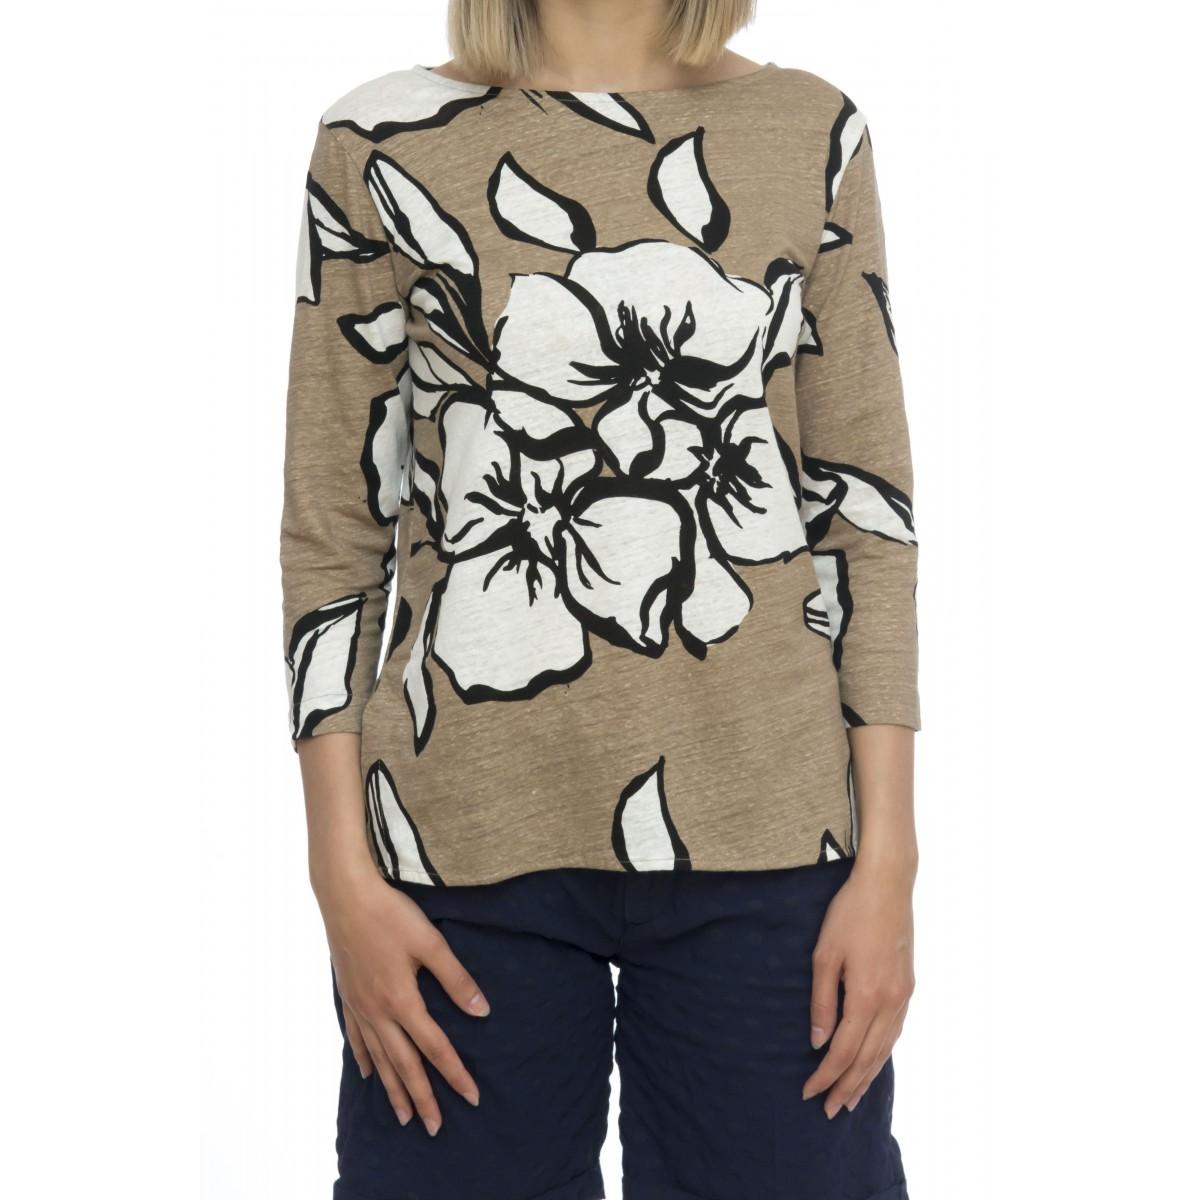 T-shirt donna - J069 fts111 t-shirt manica 3-4 fantasia fiori